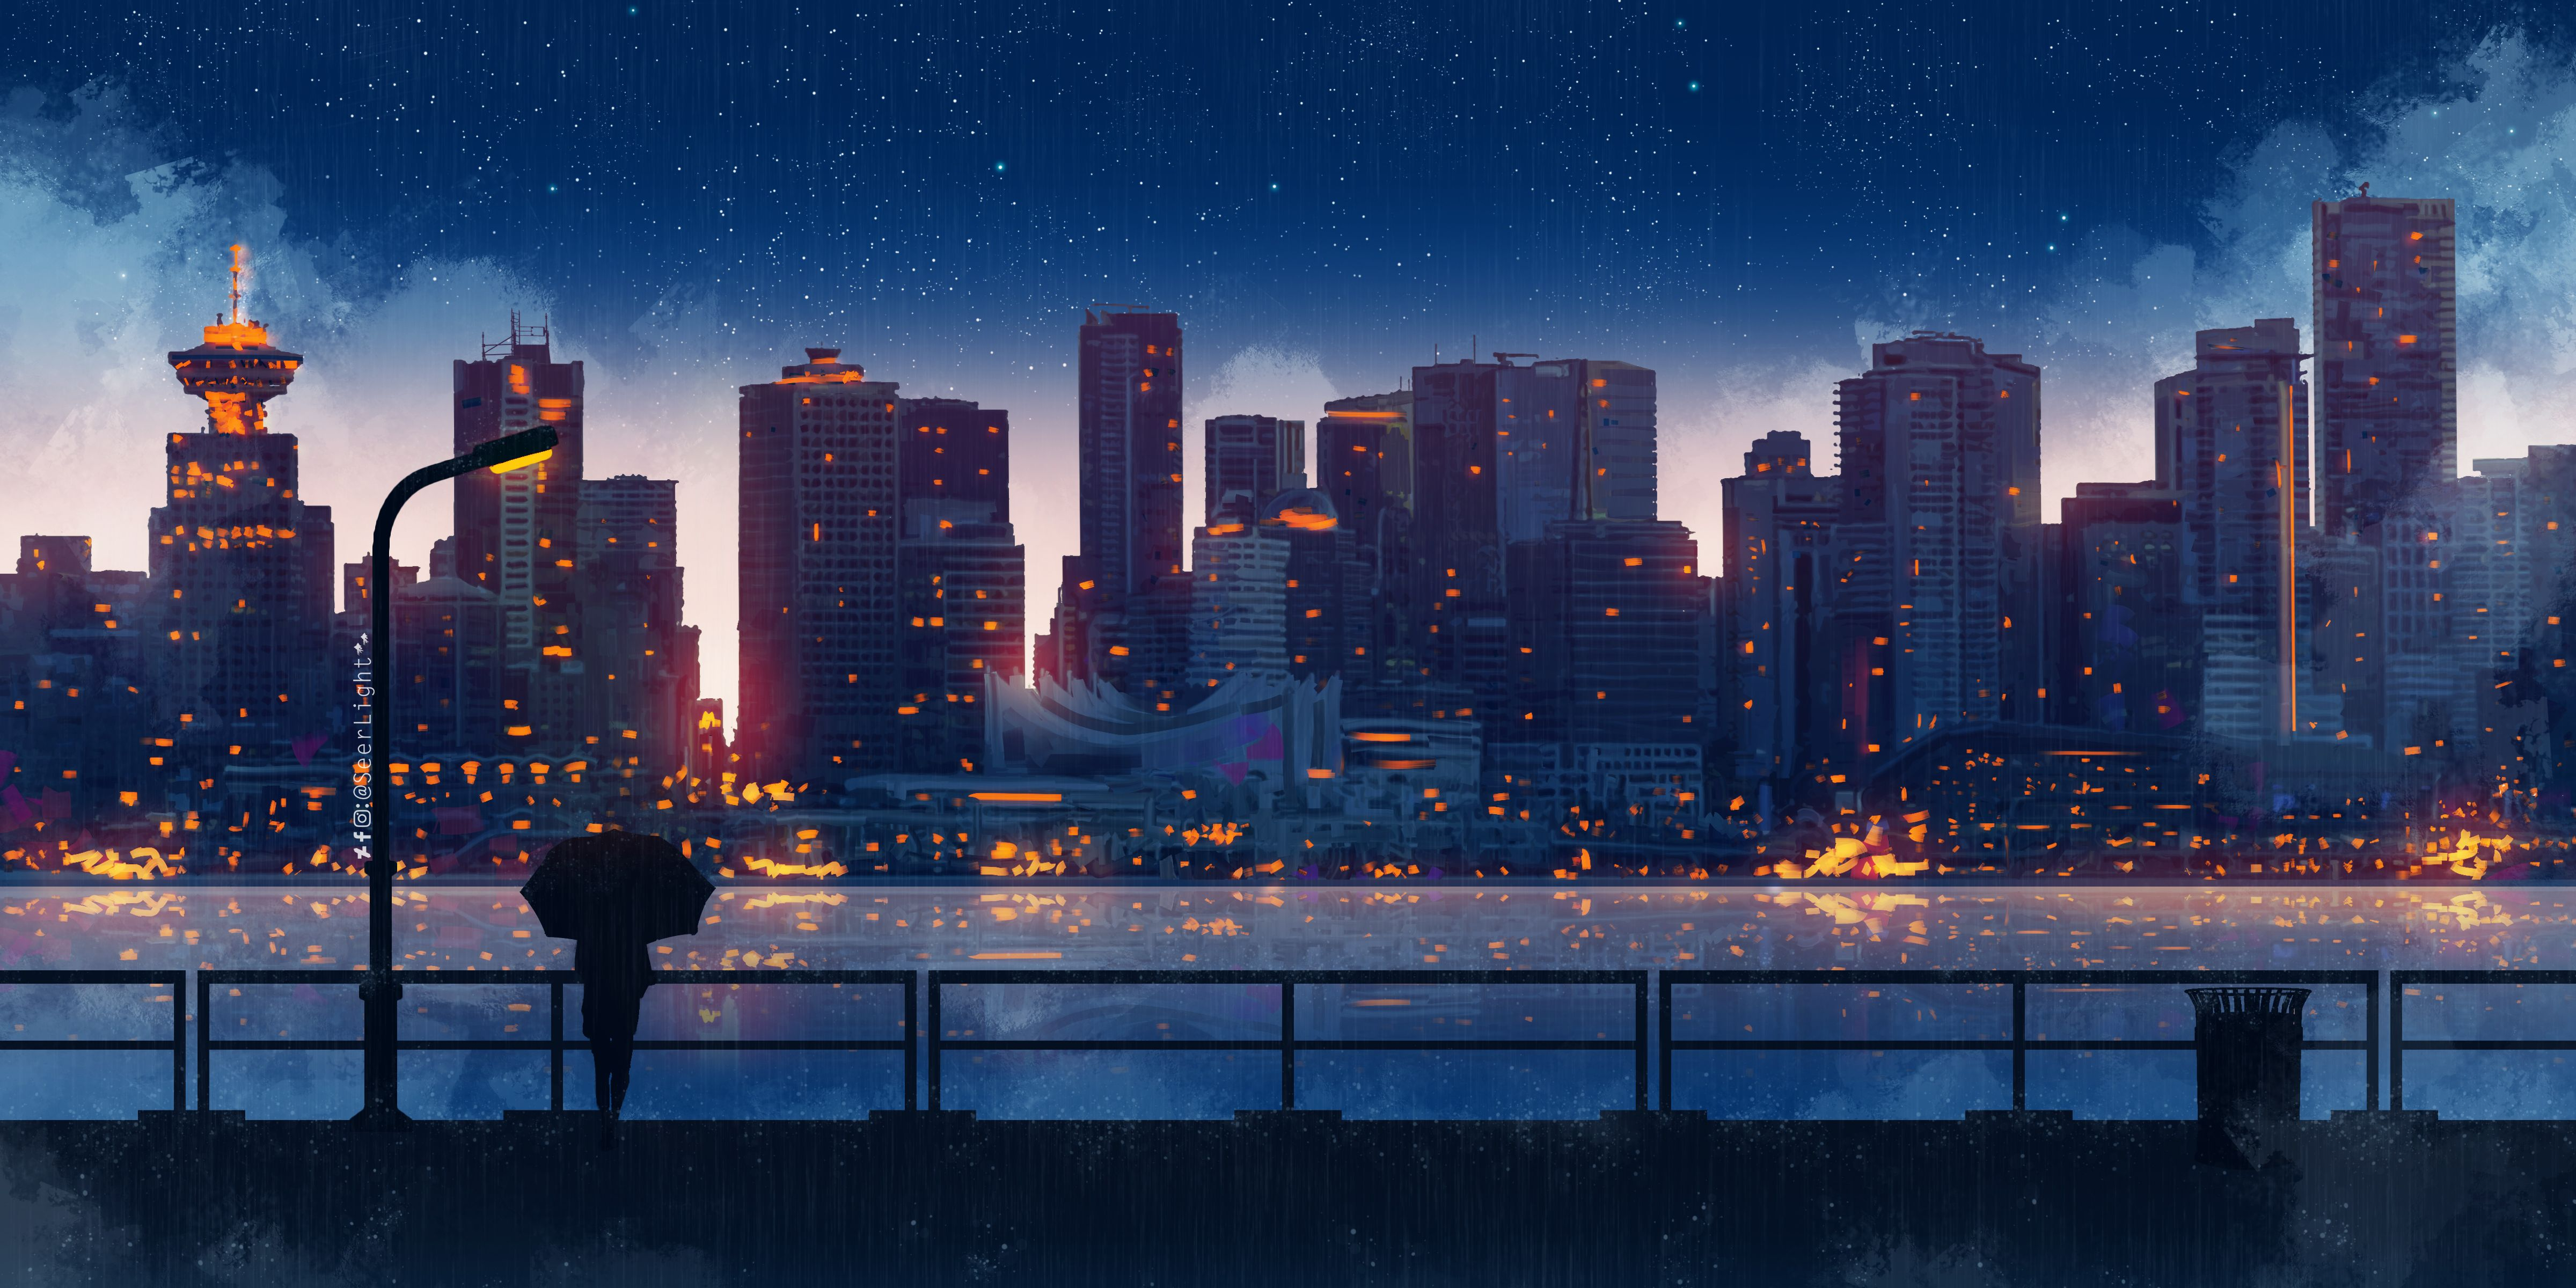 Aesthetic anime theme illustration of a boy and girl. Anime 4800x2400 anime city building women umbrella night ...